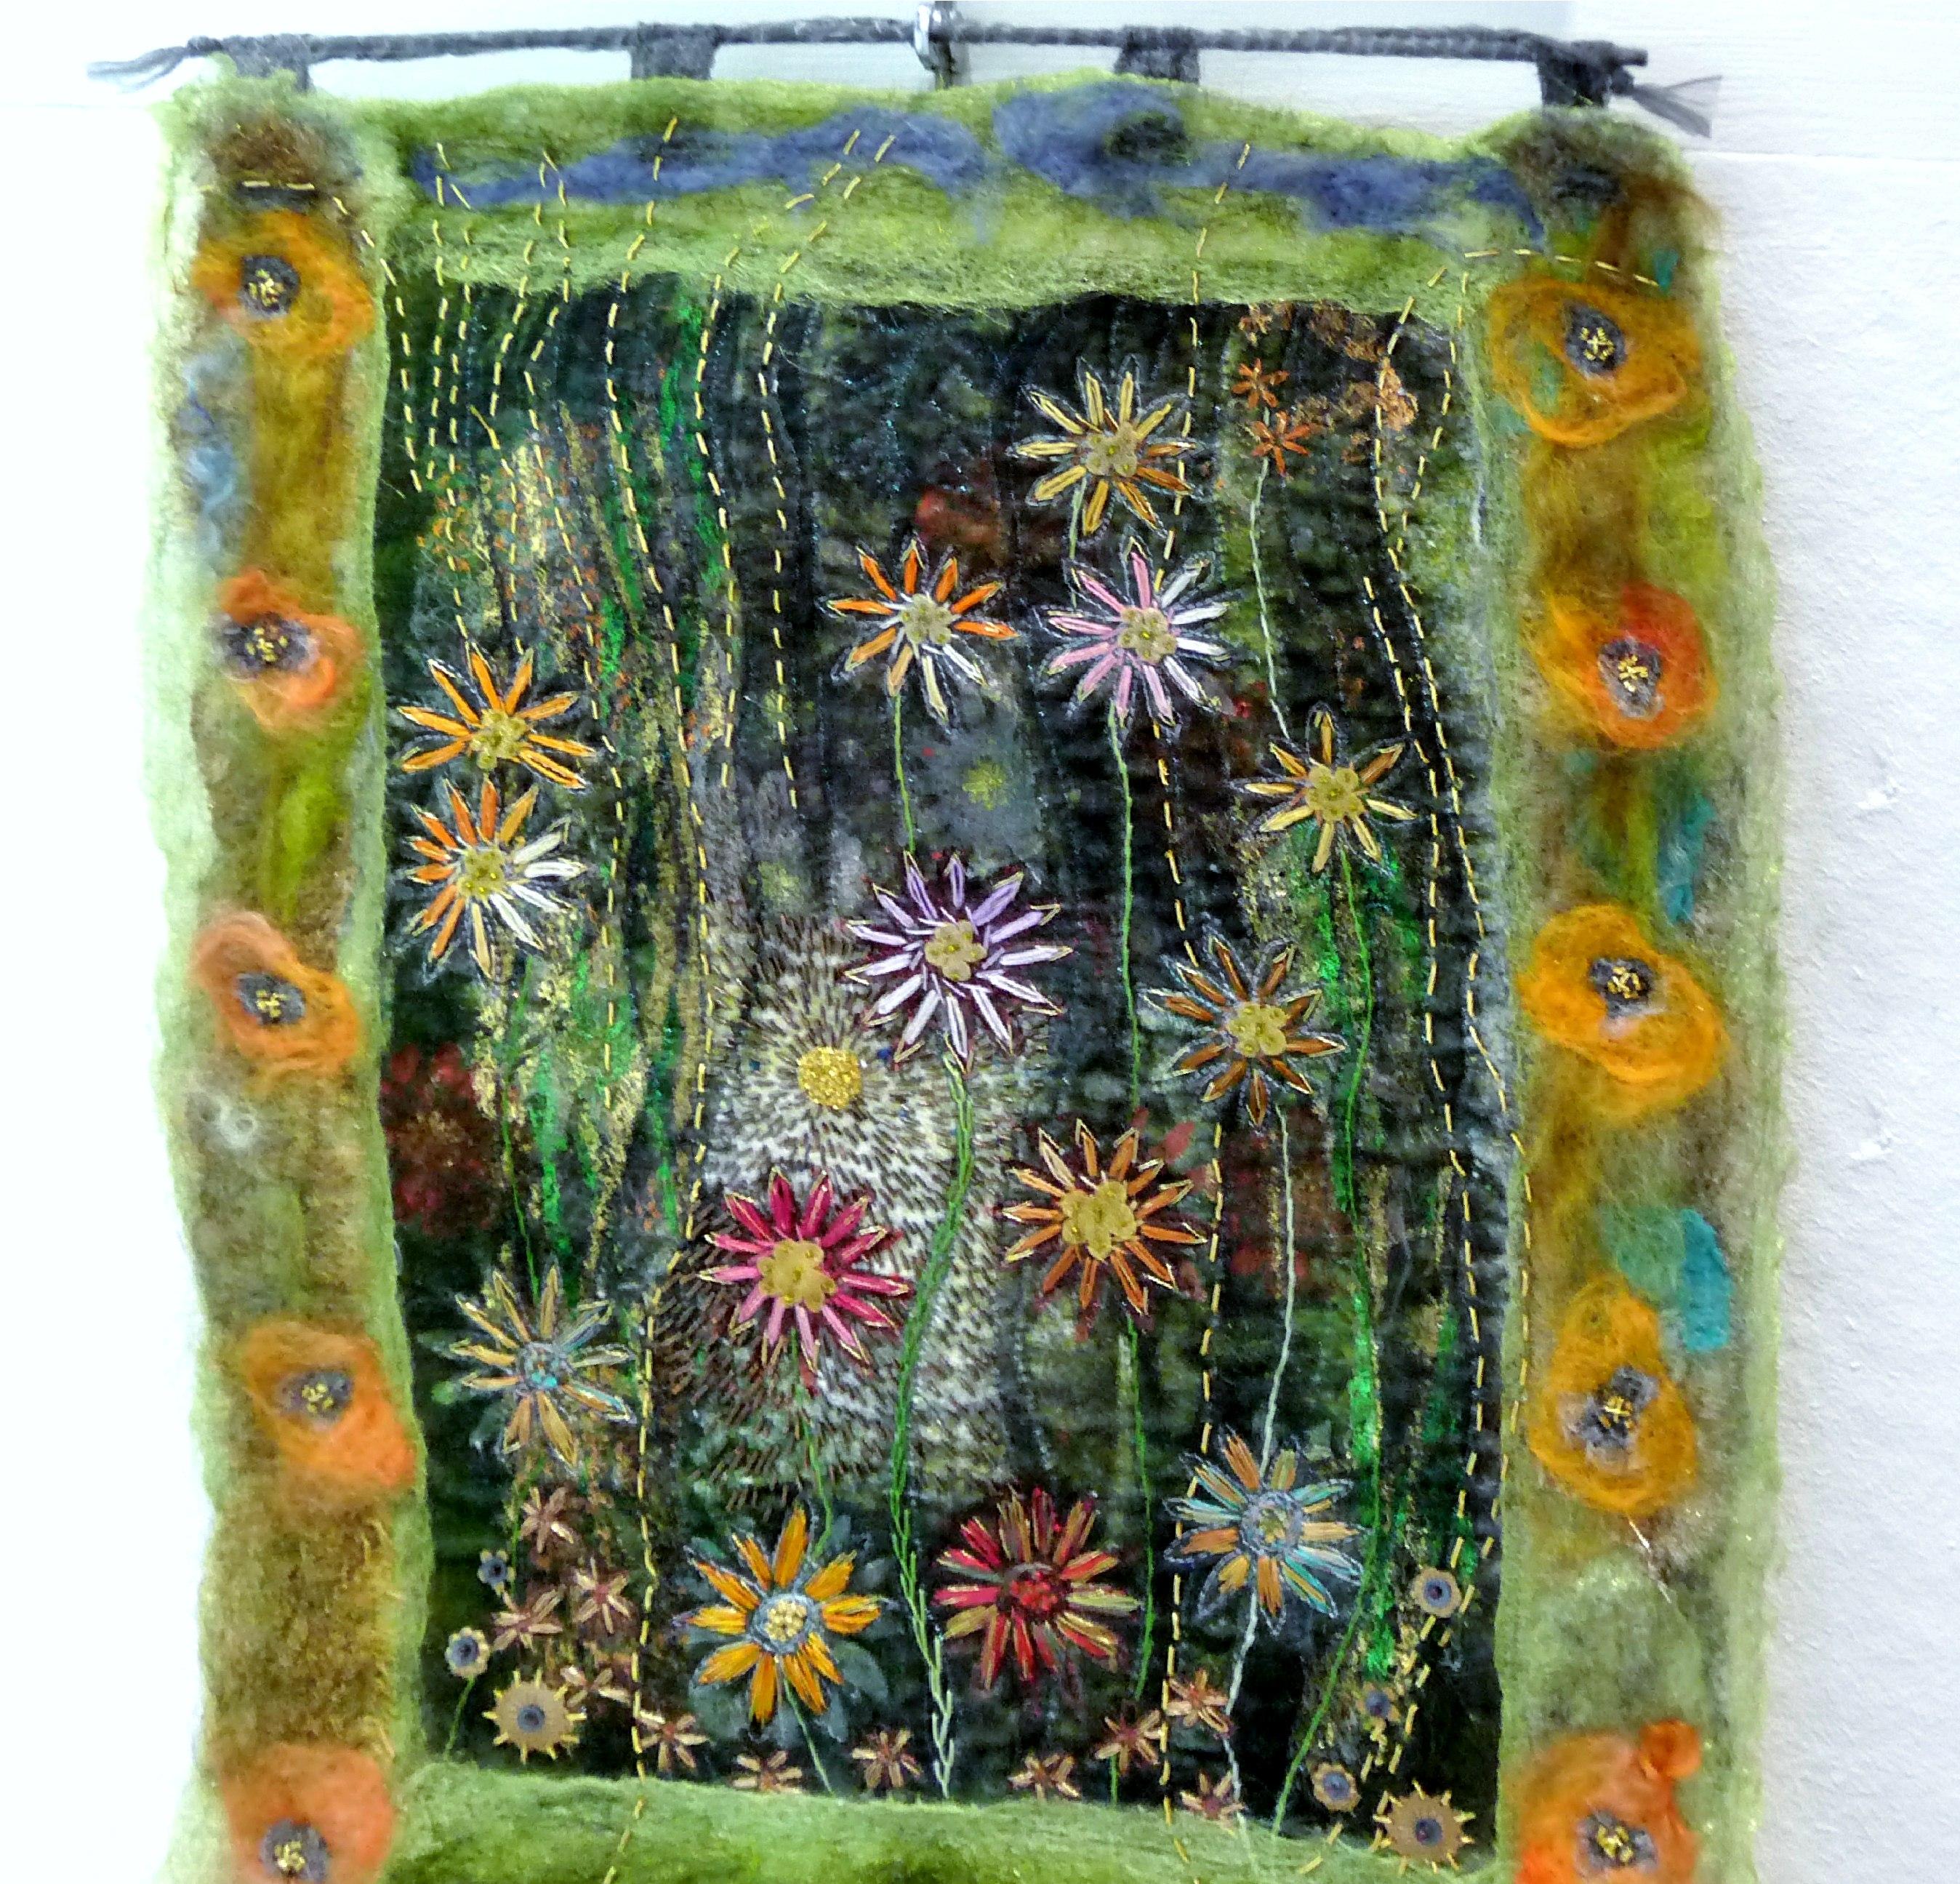 PEEPING THROUGH by Susan Hinde, hand & machine stitched printed velvet